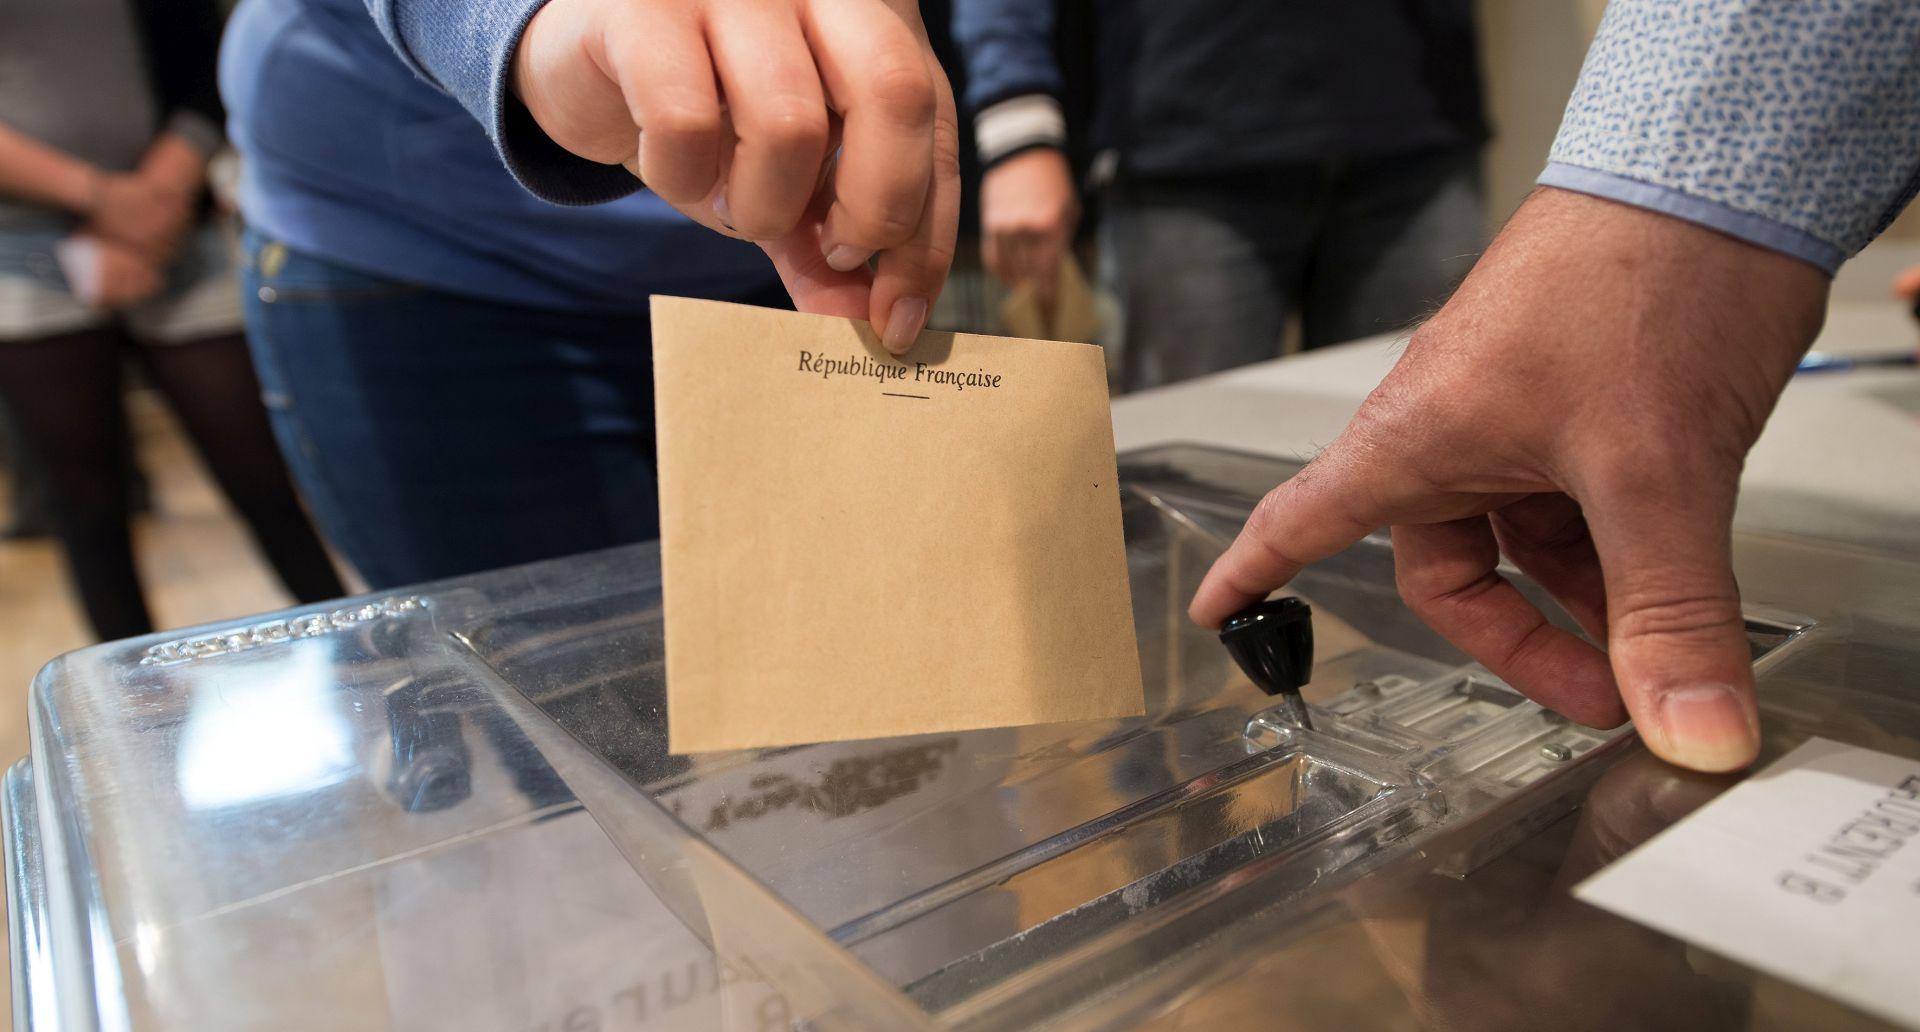 Izlazne ankete Macron vodi, slijedi Le Pen